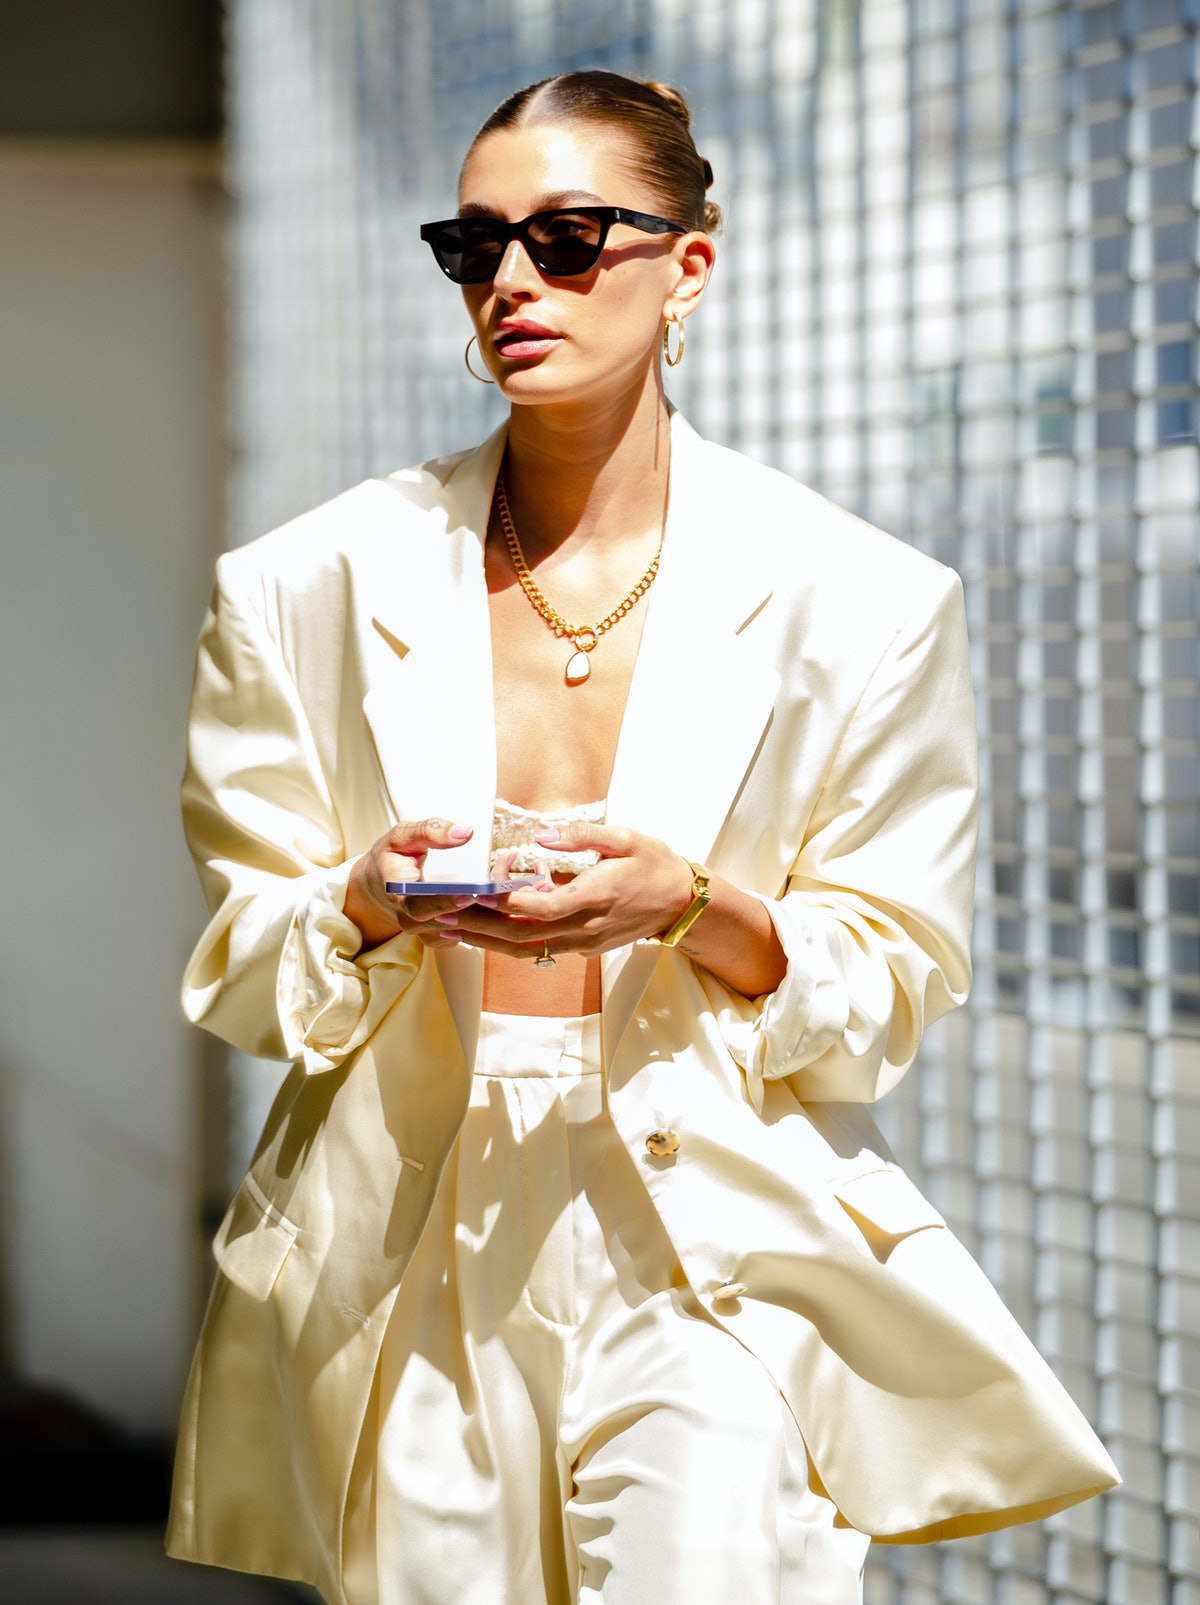 LOS ANGELES, CALIFORNIA - JULY 06: Hailey Bieber is seen on July 06, 2021 in Los Angeles, California...